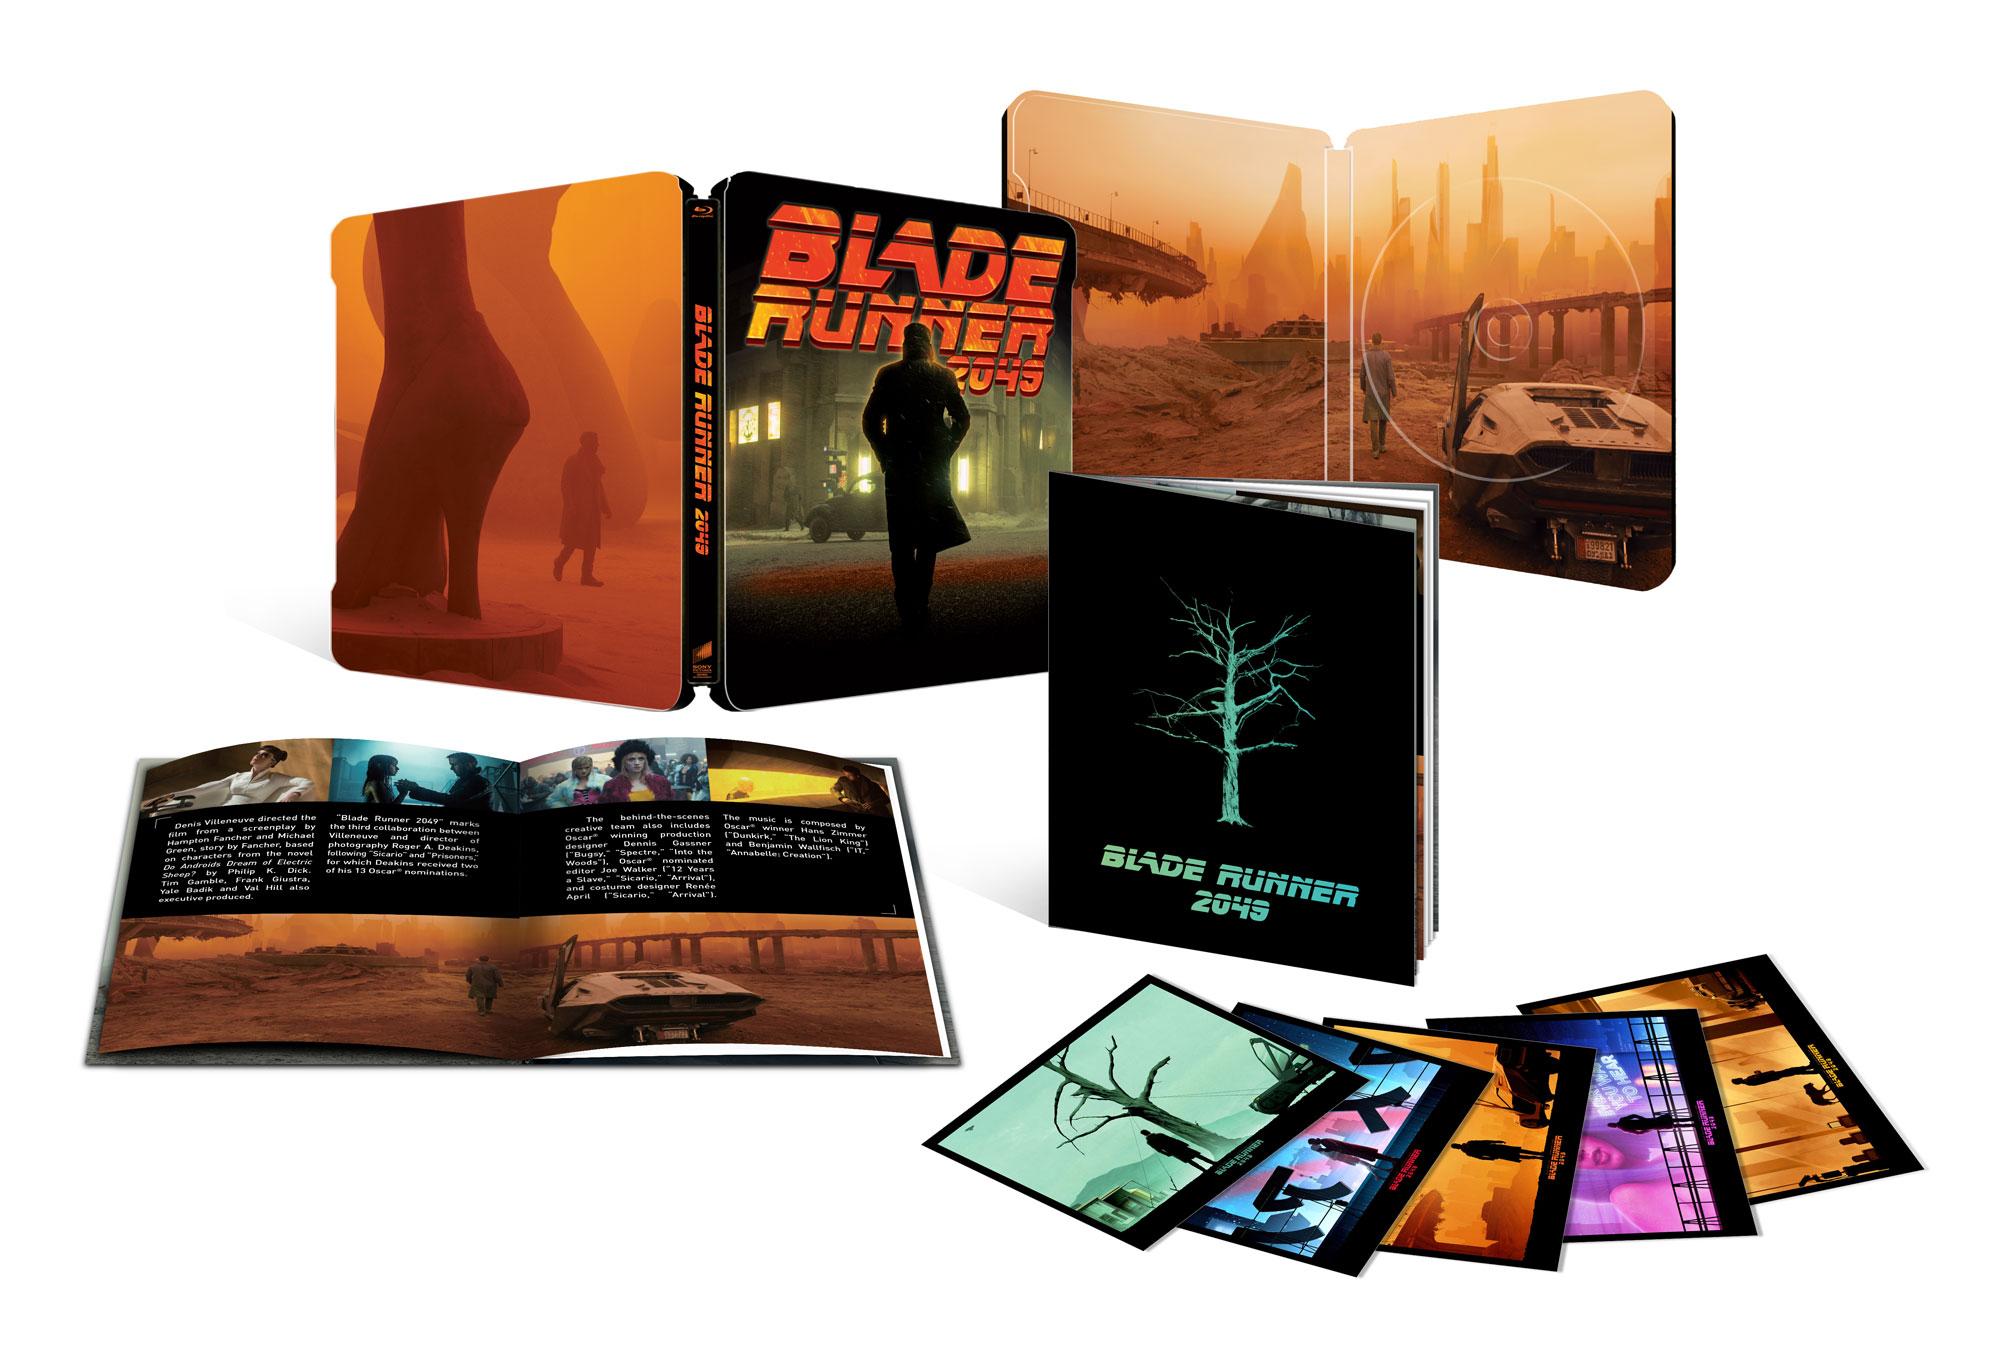 Blade Runner 2049 - Steelbook